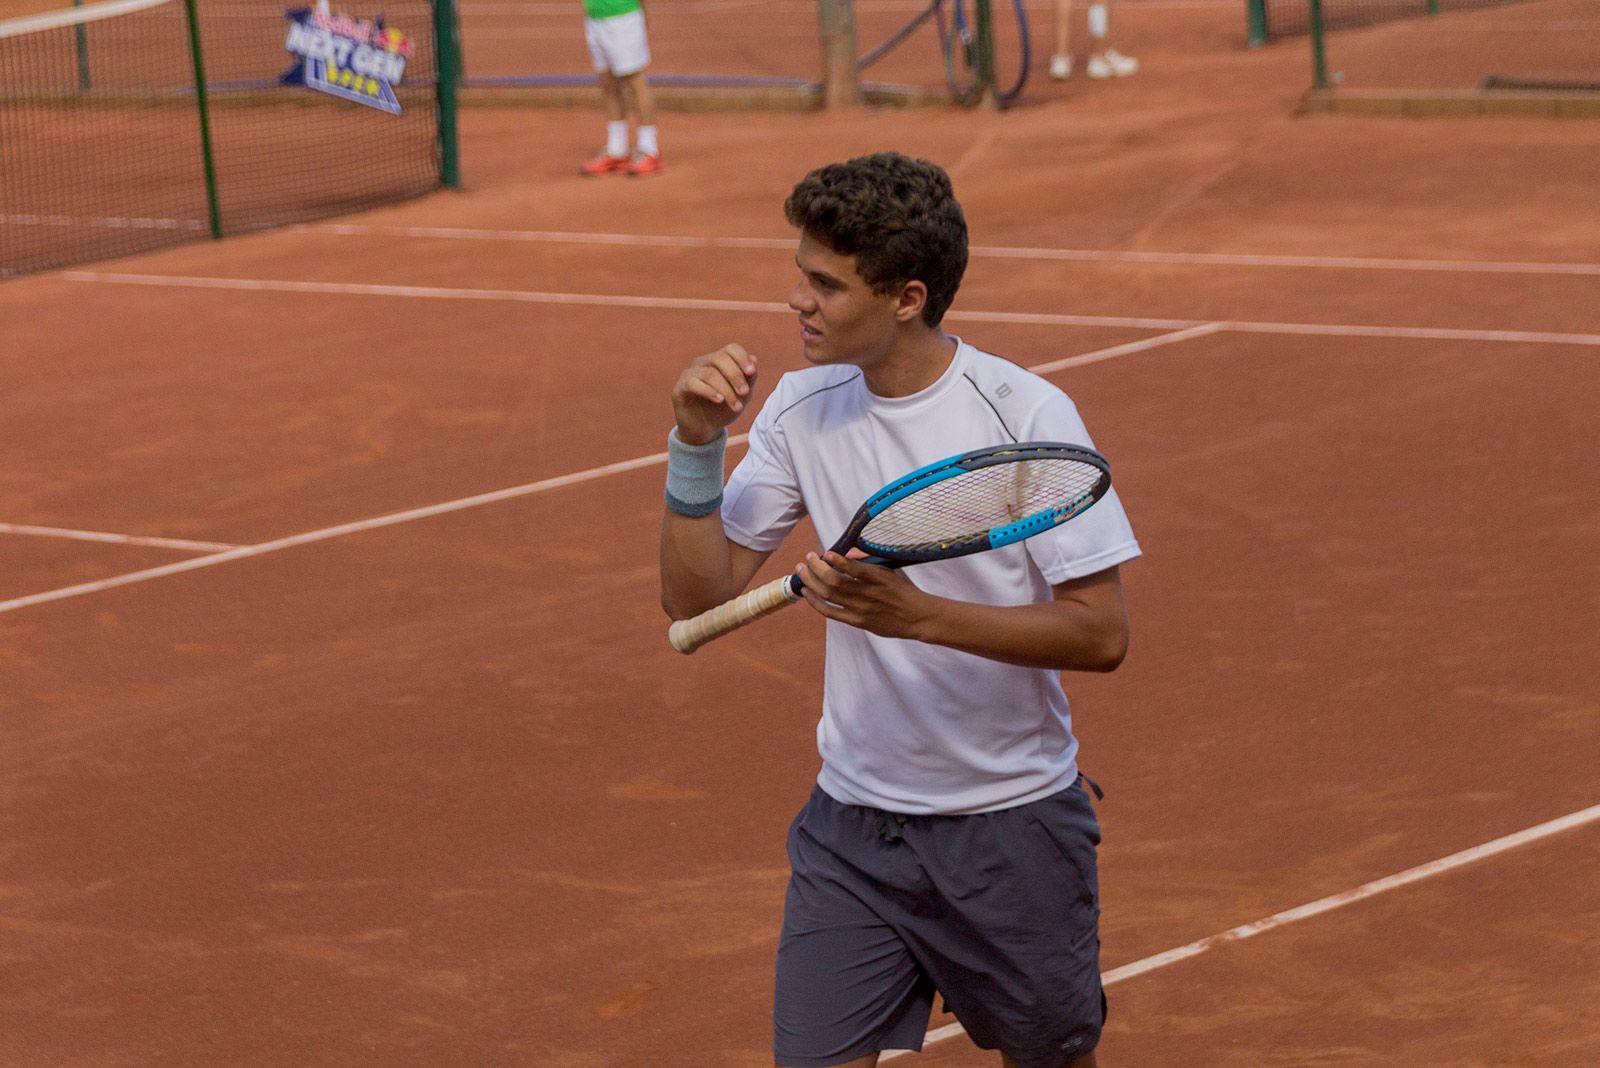 Torneig internacional de Tennis. FOTO: Paula Galván